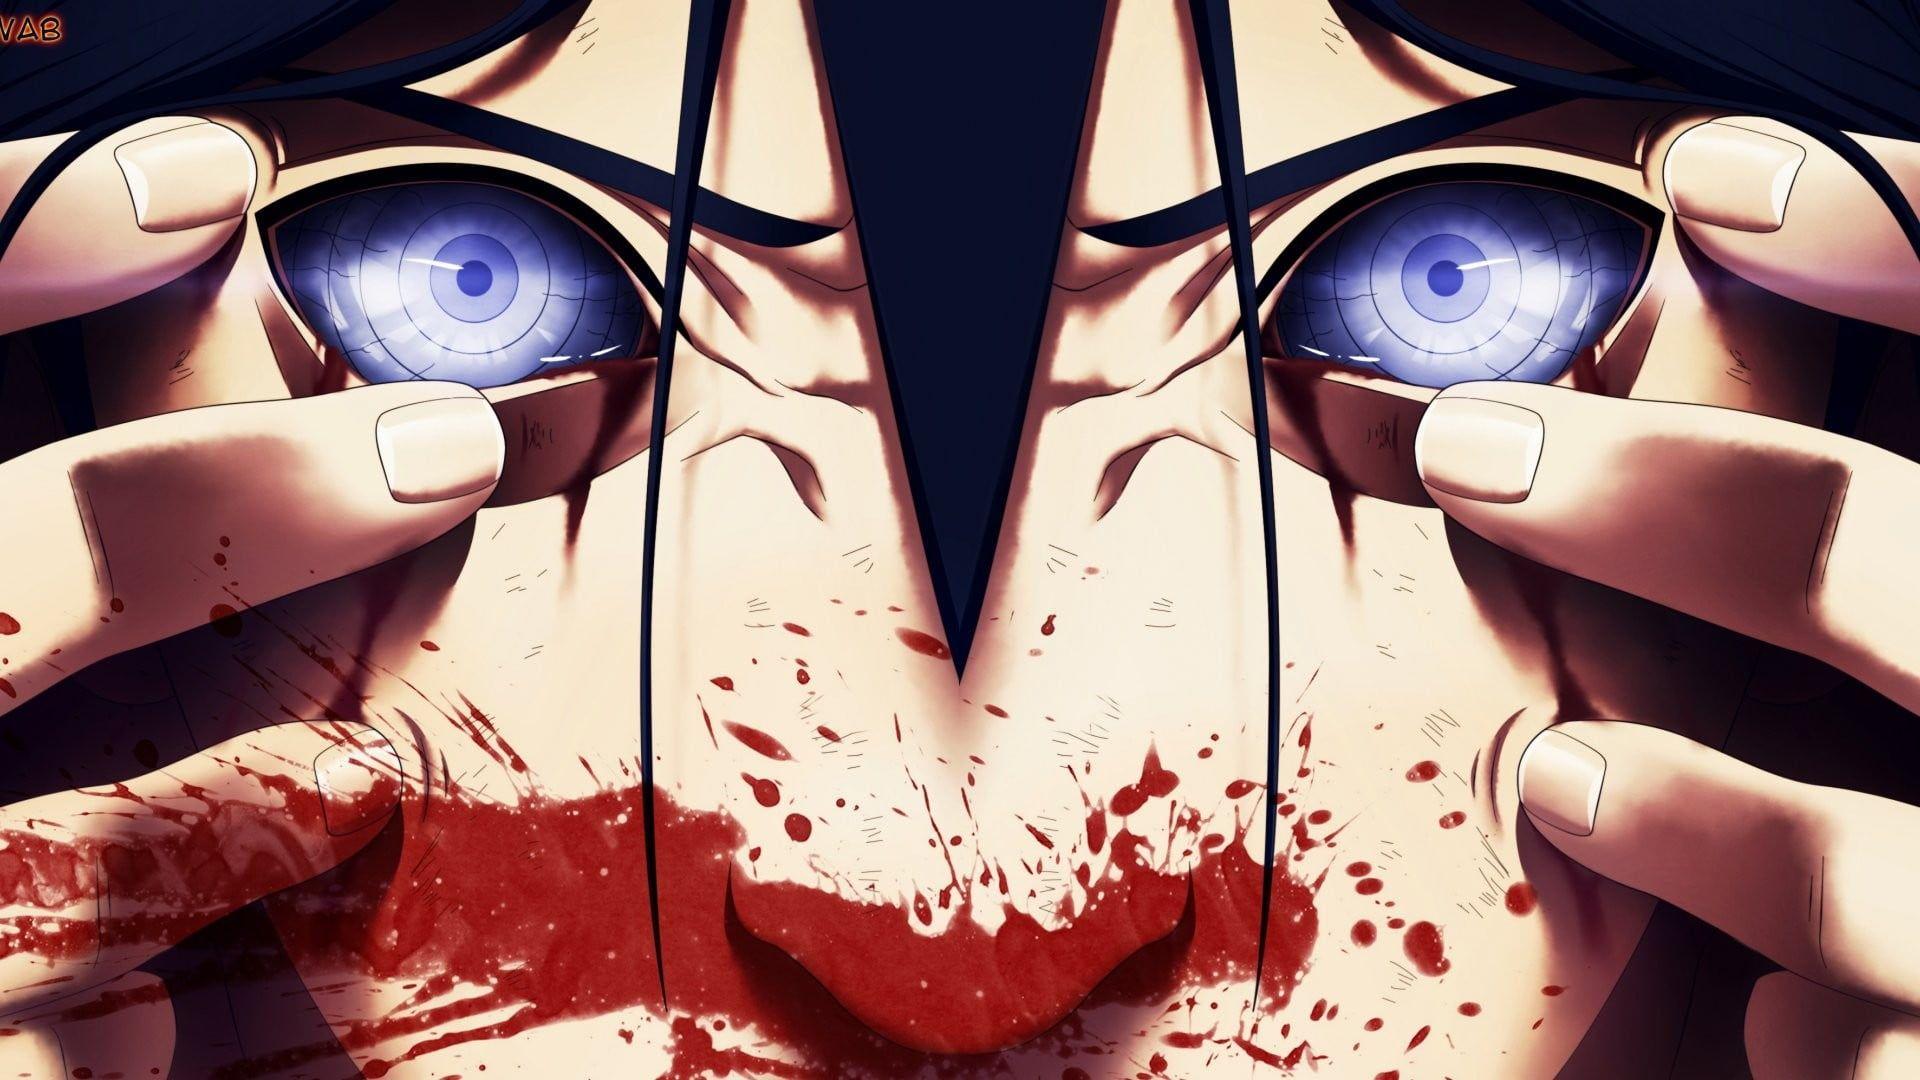 anime character digital wallpaper Naruto Shippuuden Uchiha